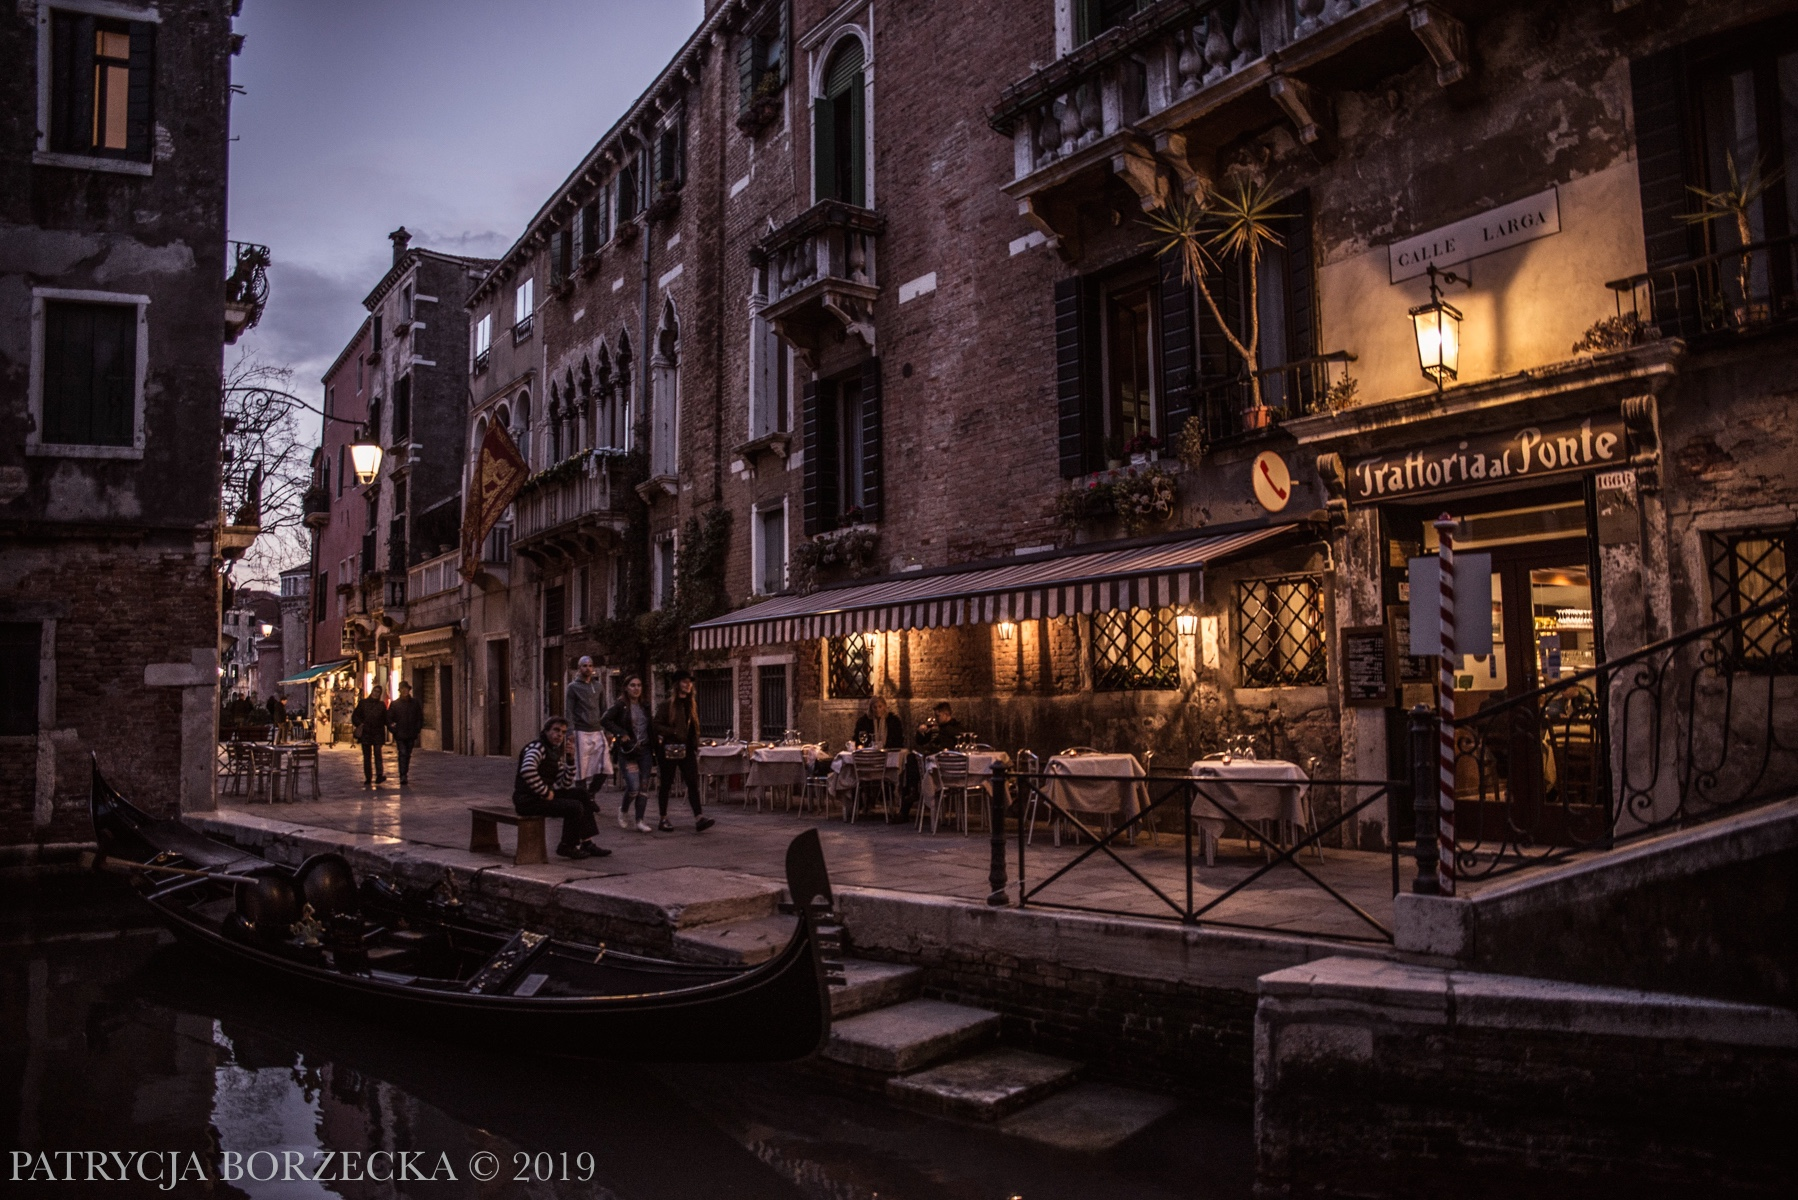 PatrycjaBorzecka-Photo-Venice-09